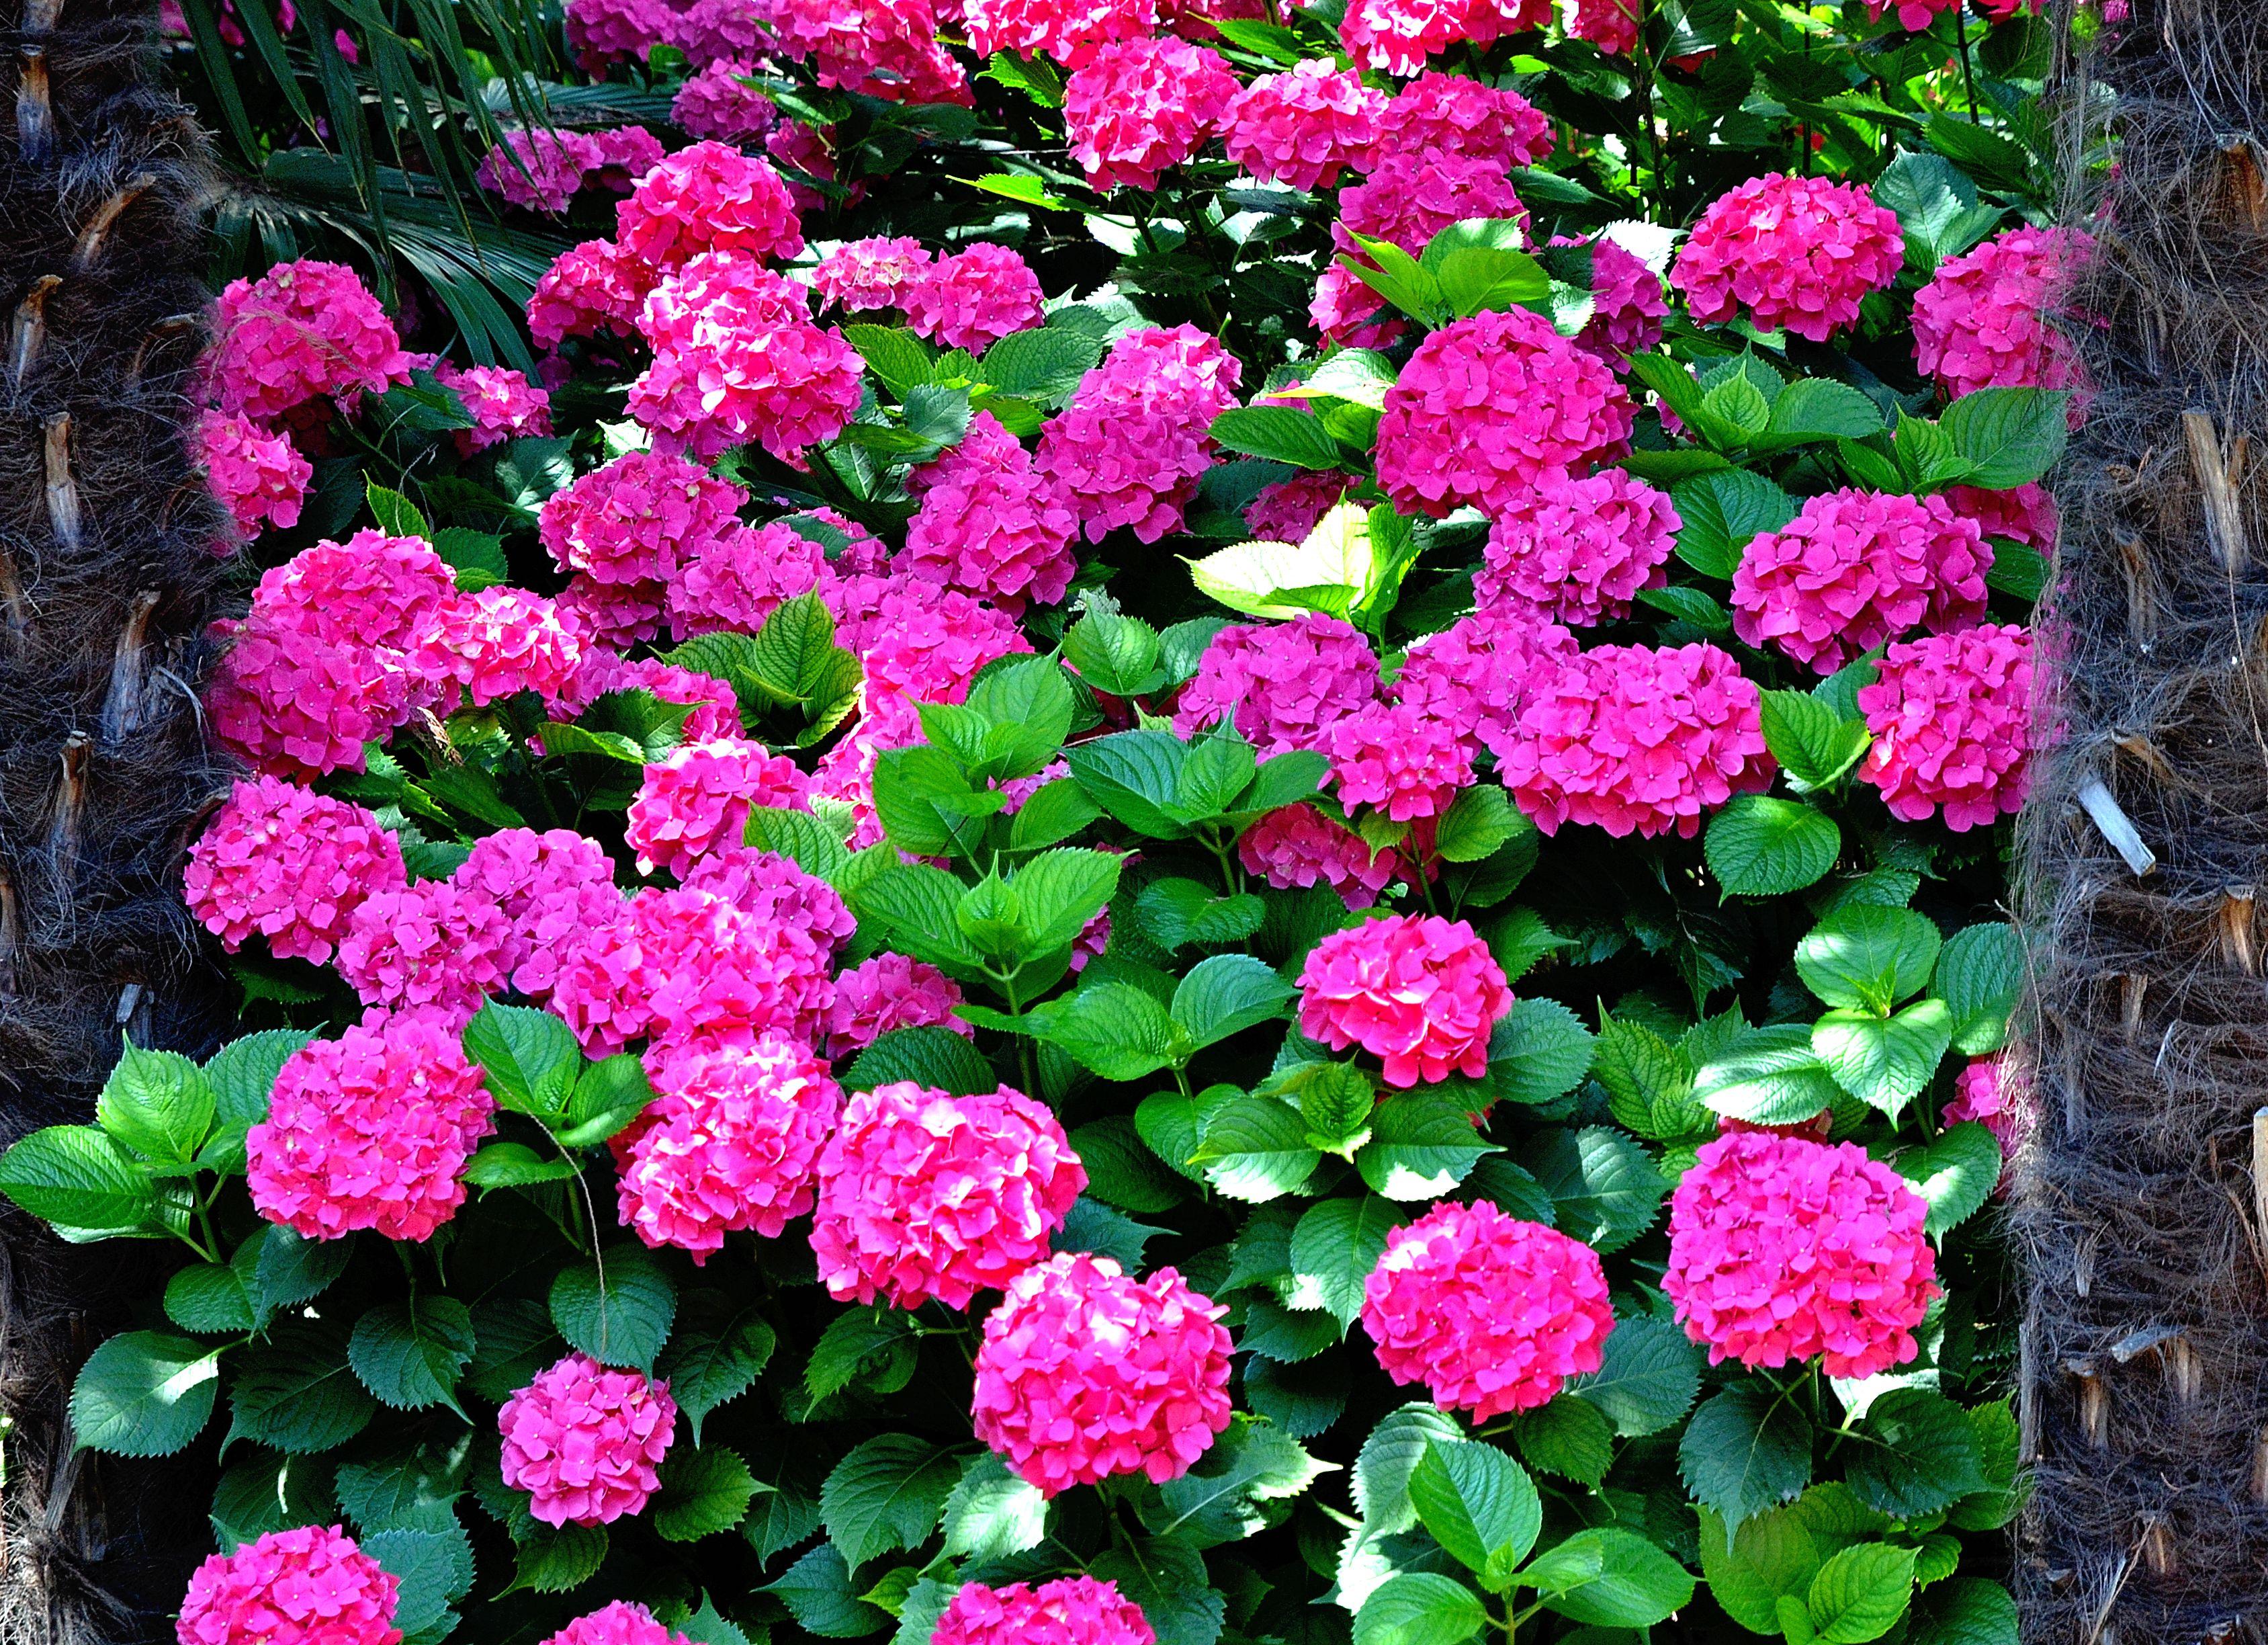 Fioritura Ortensie Azzurre : Ortensie in fioritura sprea fotografia